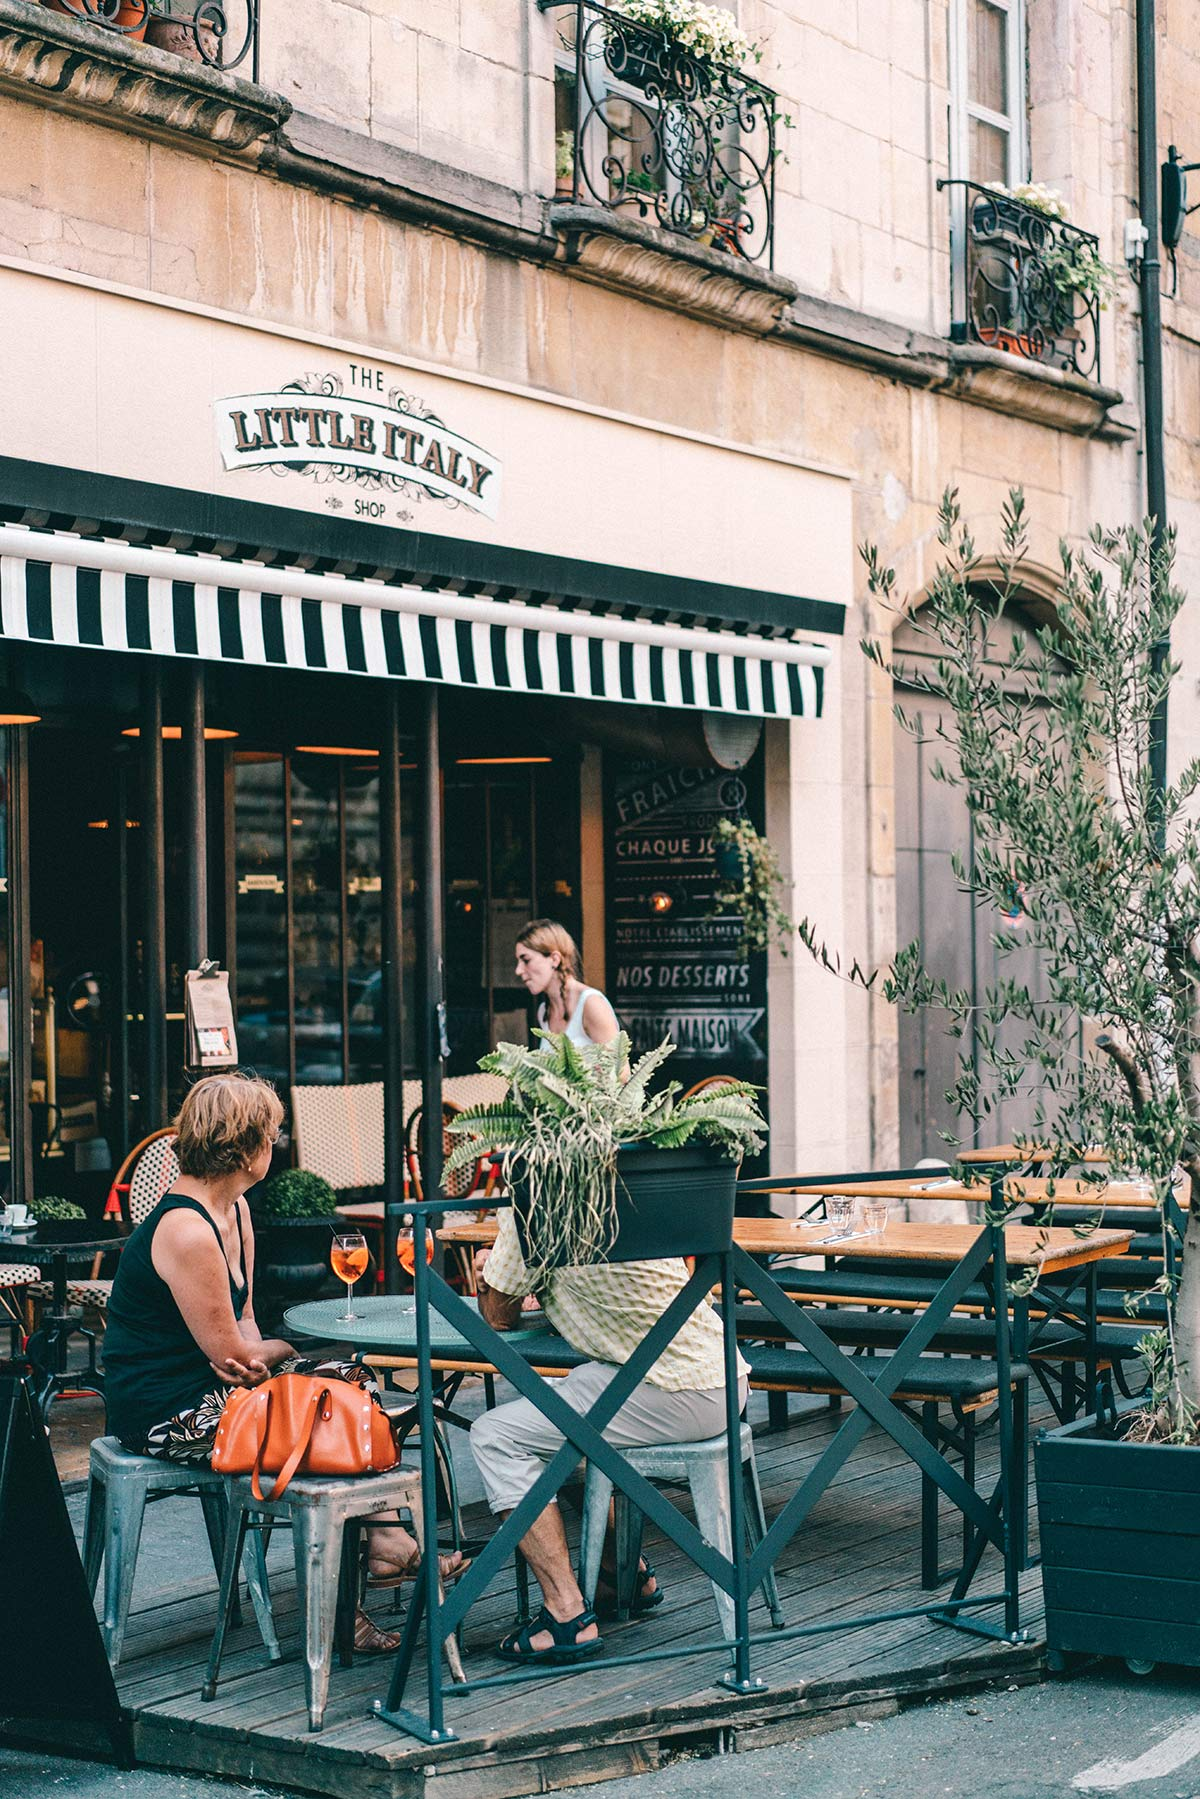 Little Italy in Dijon